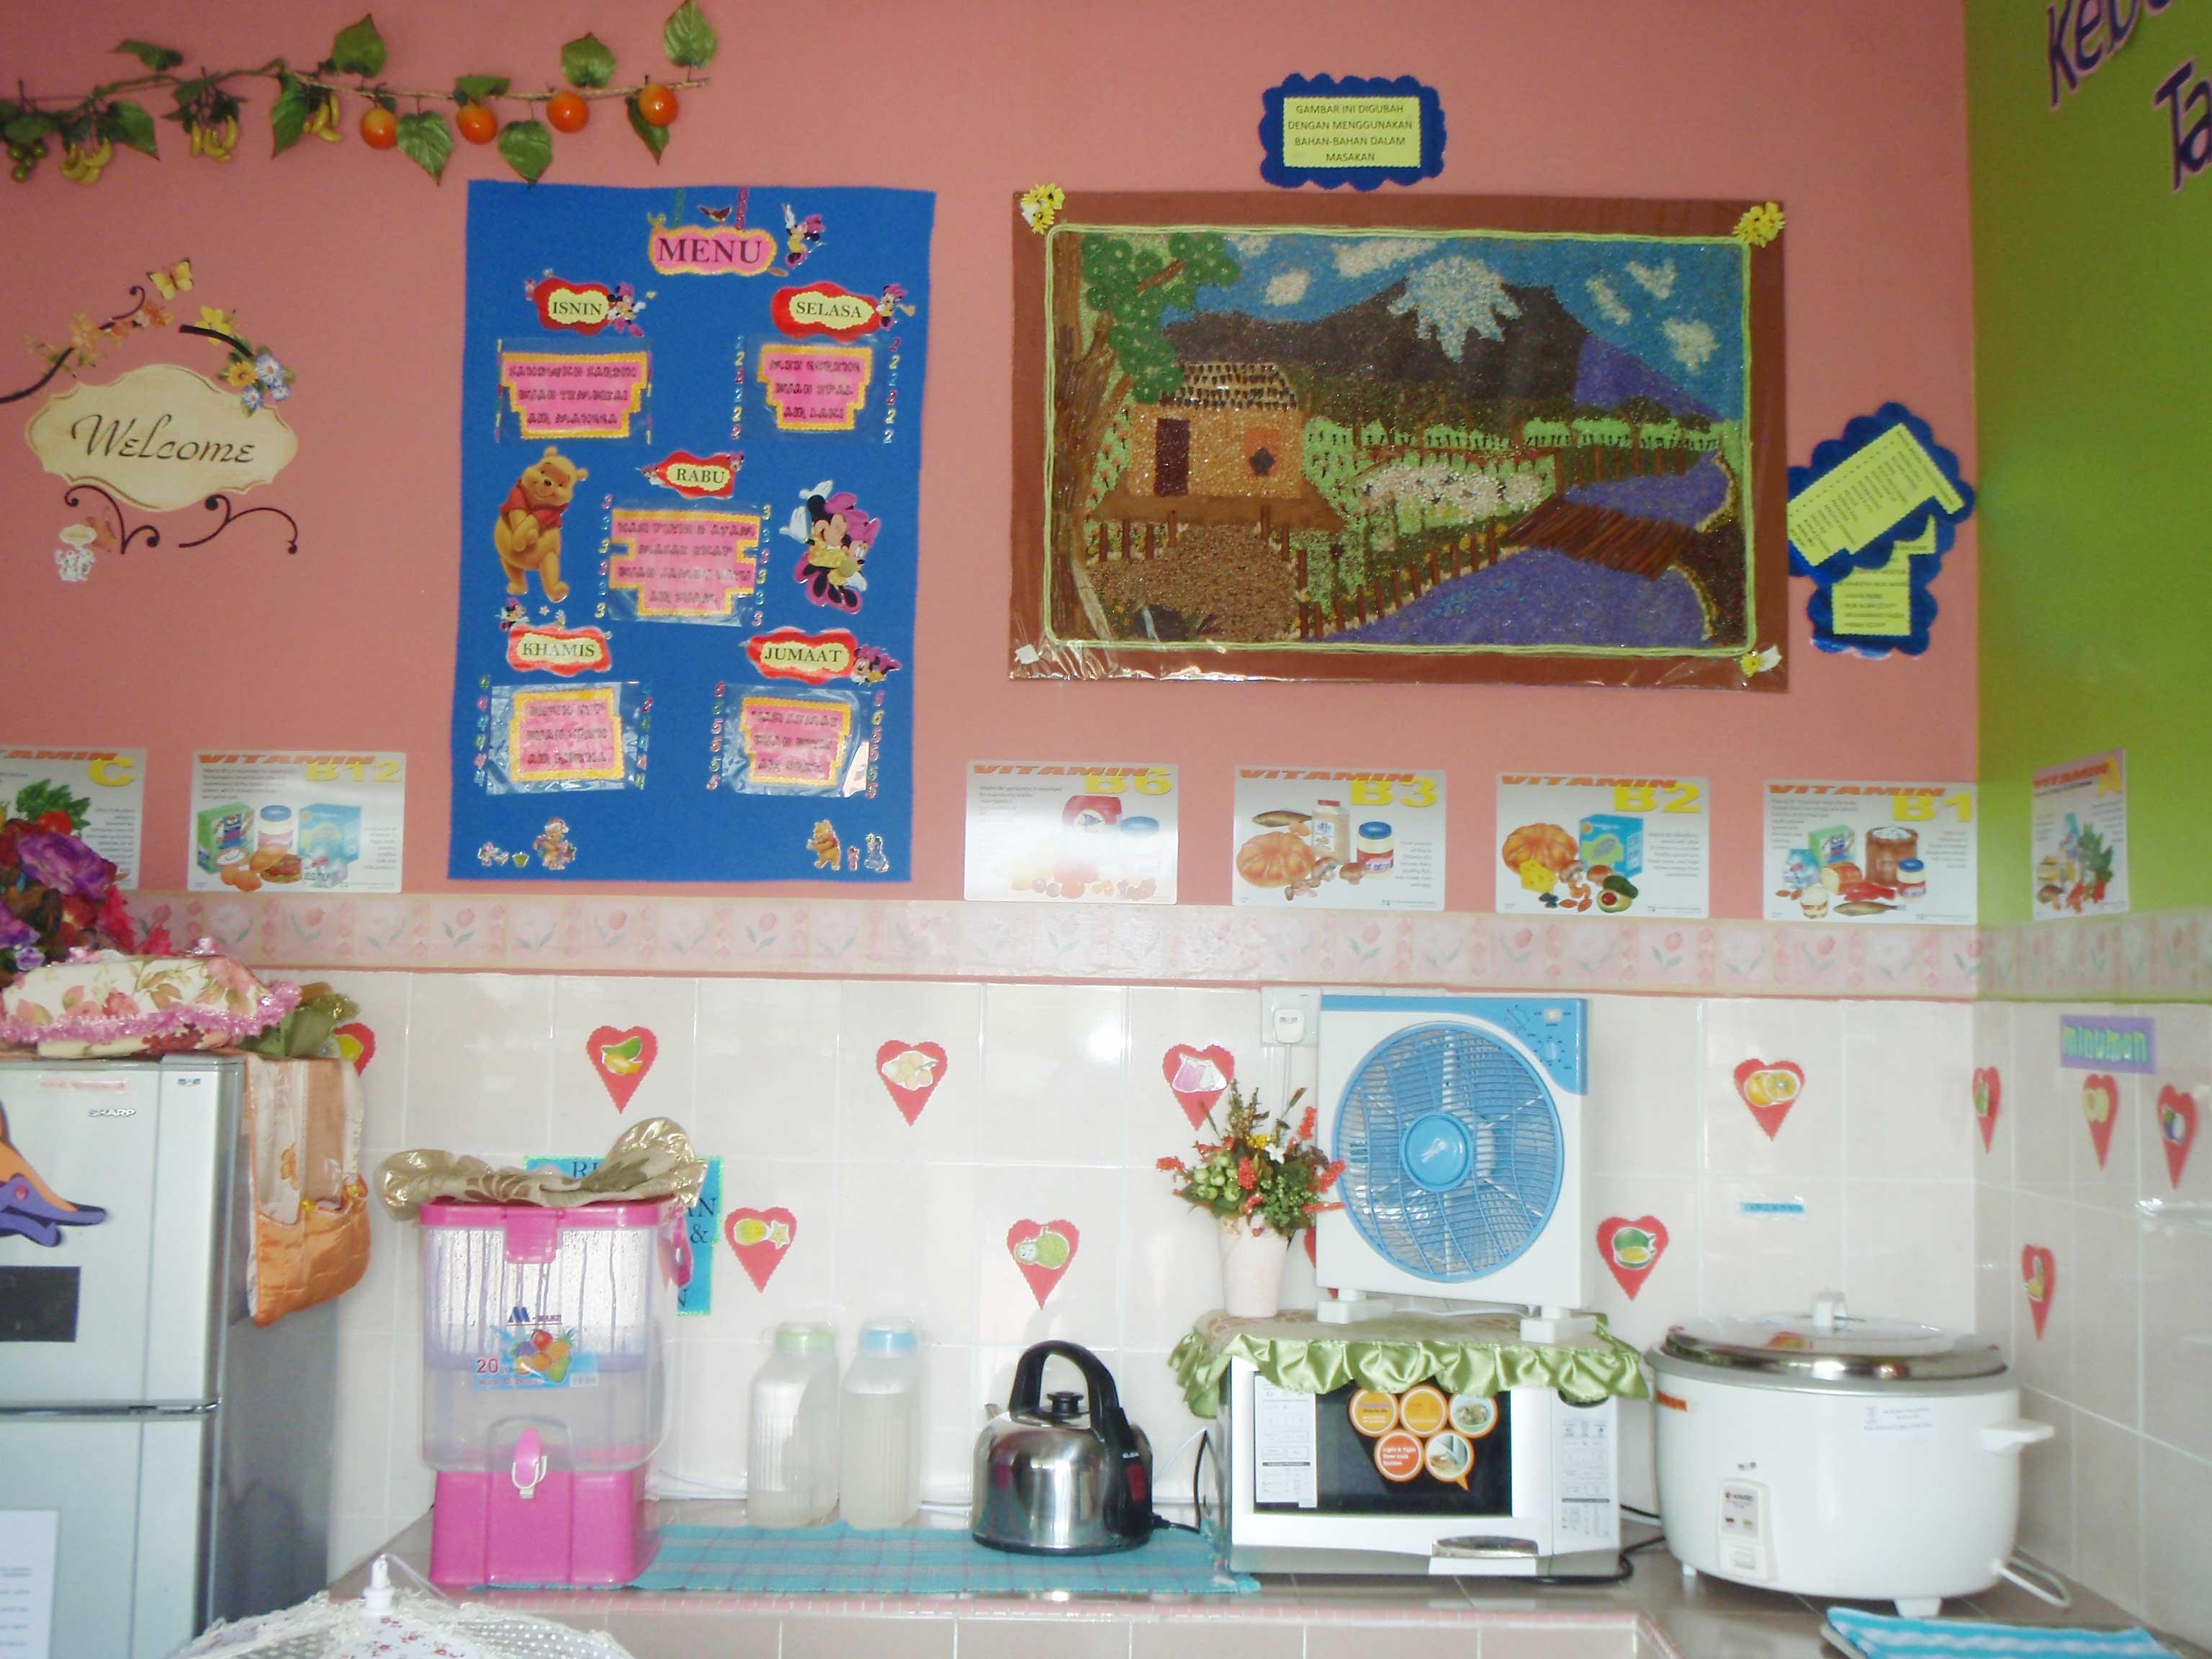 Photo Ruang Dapur Prasekolah Sk Bukit Jelutong